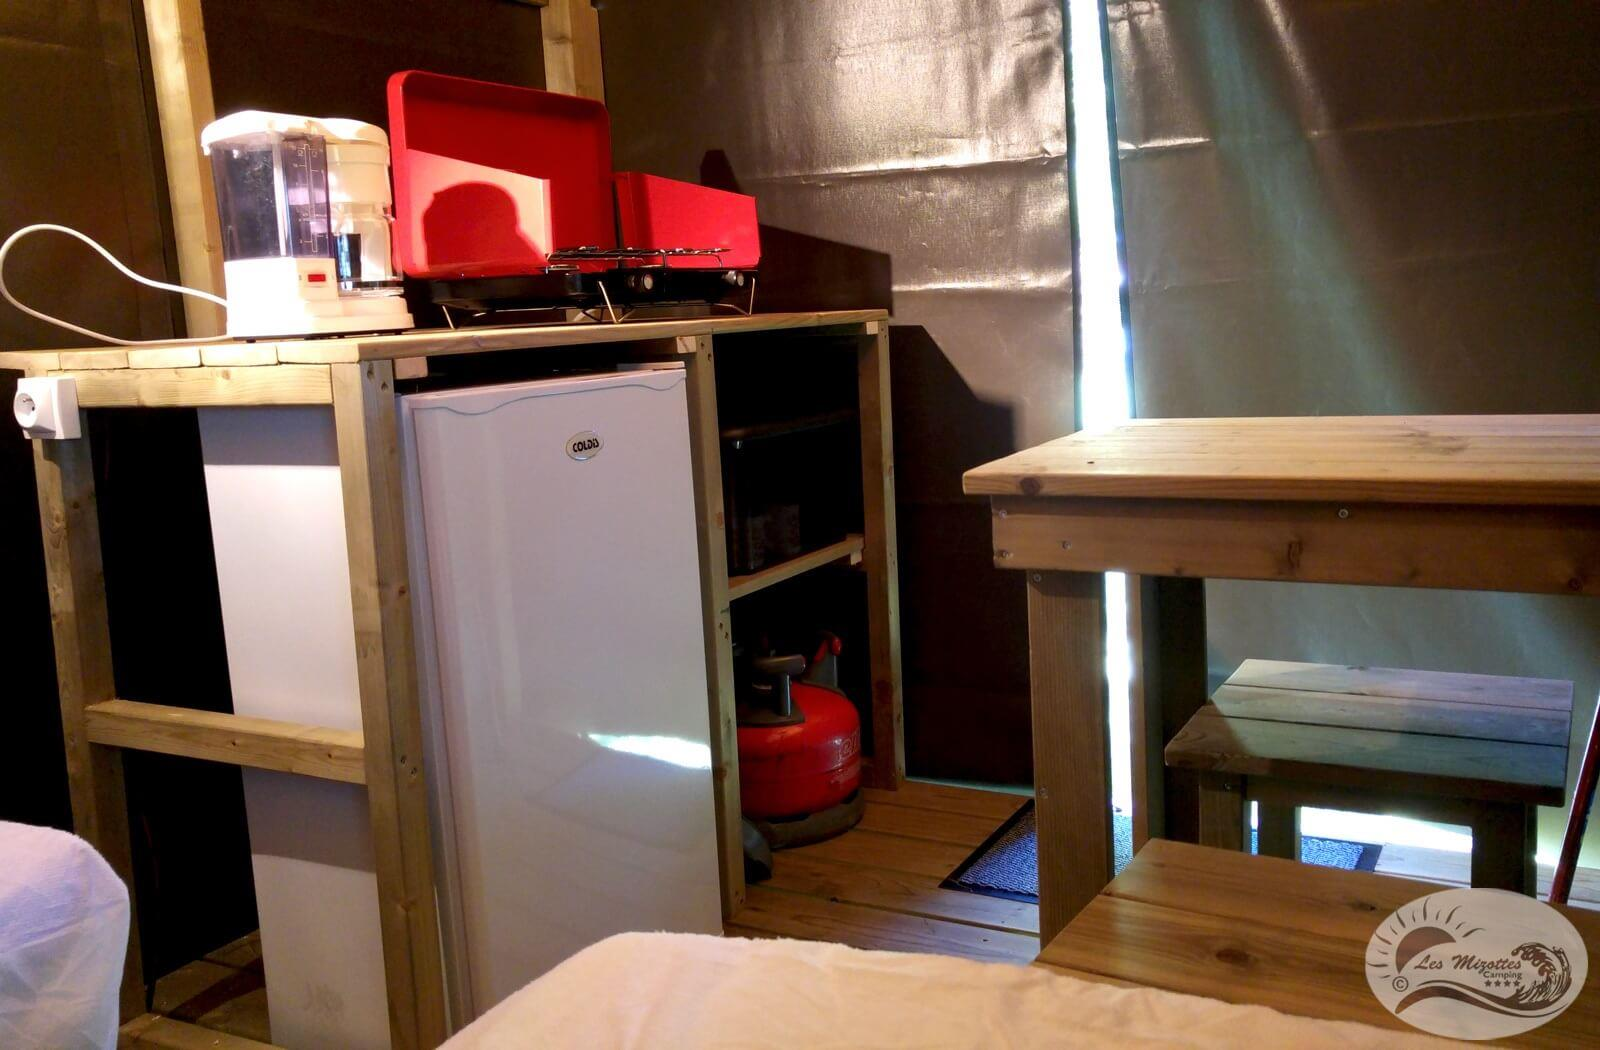 Location - Lodg'yssée 1 Chambre 7 M² - Camping Les Mizottes